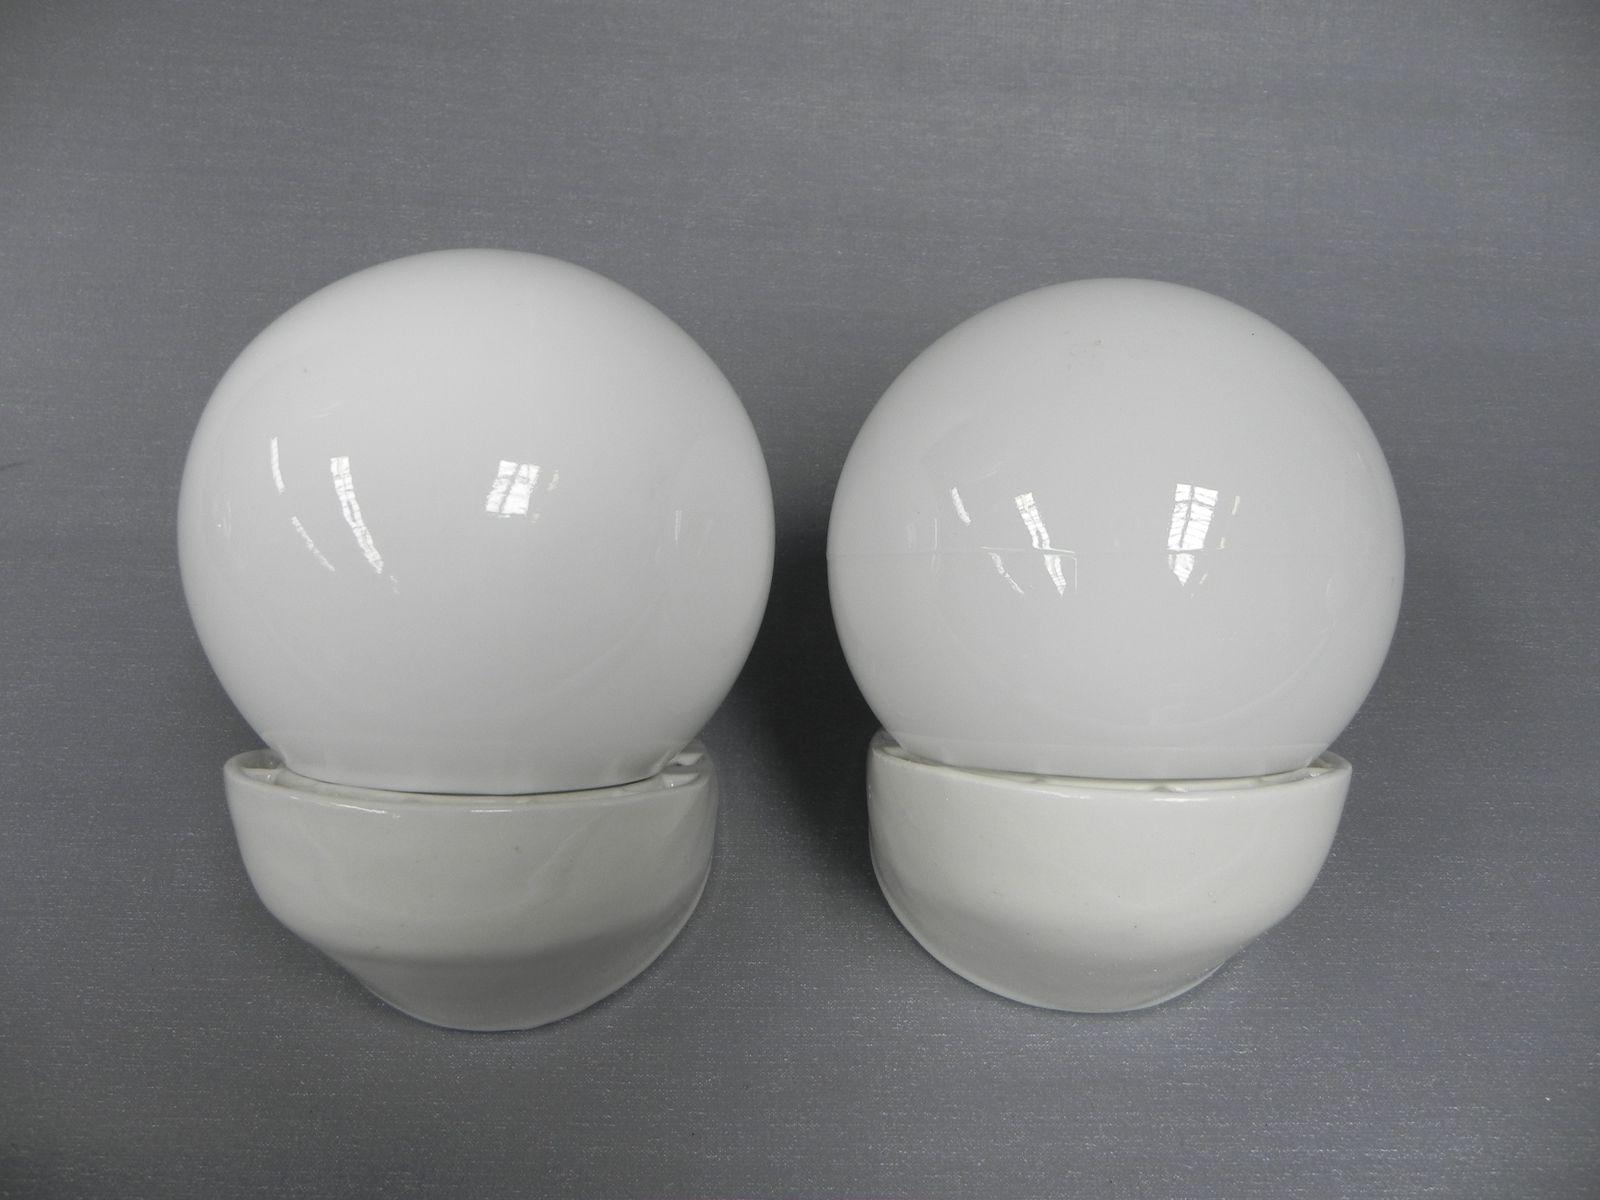 Vintage Wandlampen aus Glas & Porzellan, 1950er, 2er Set